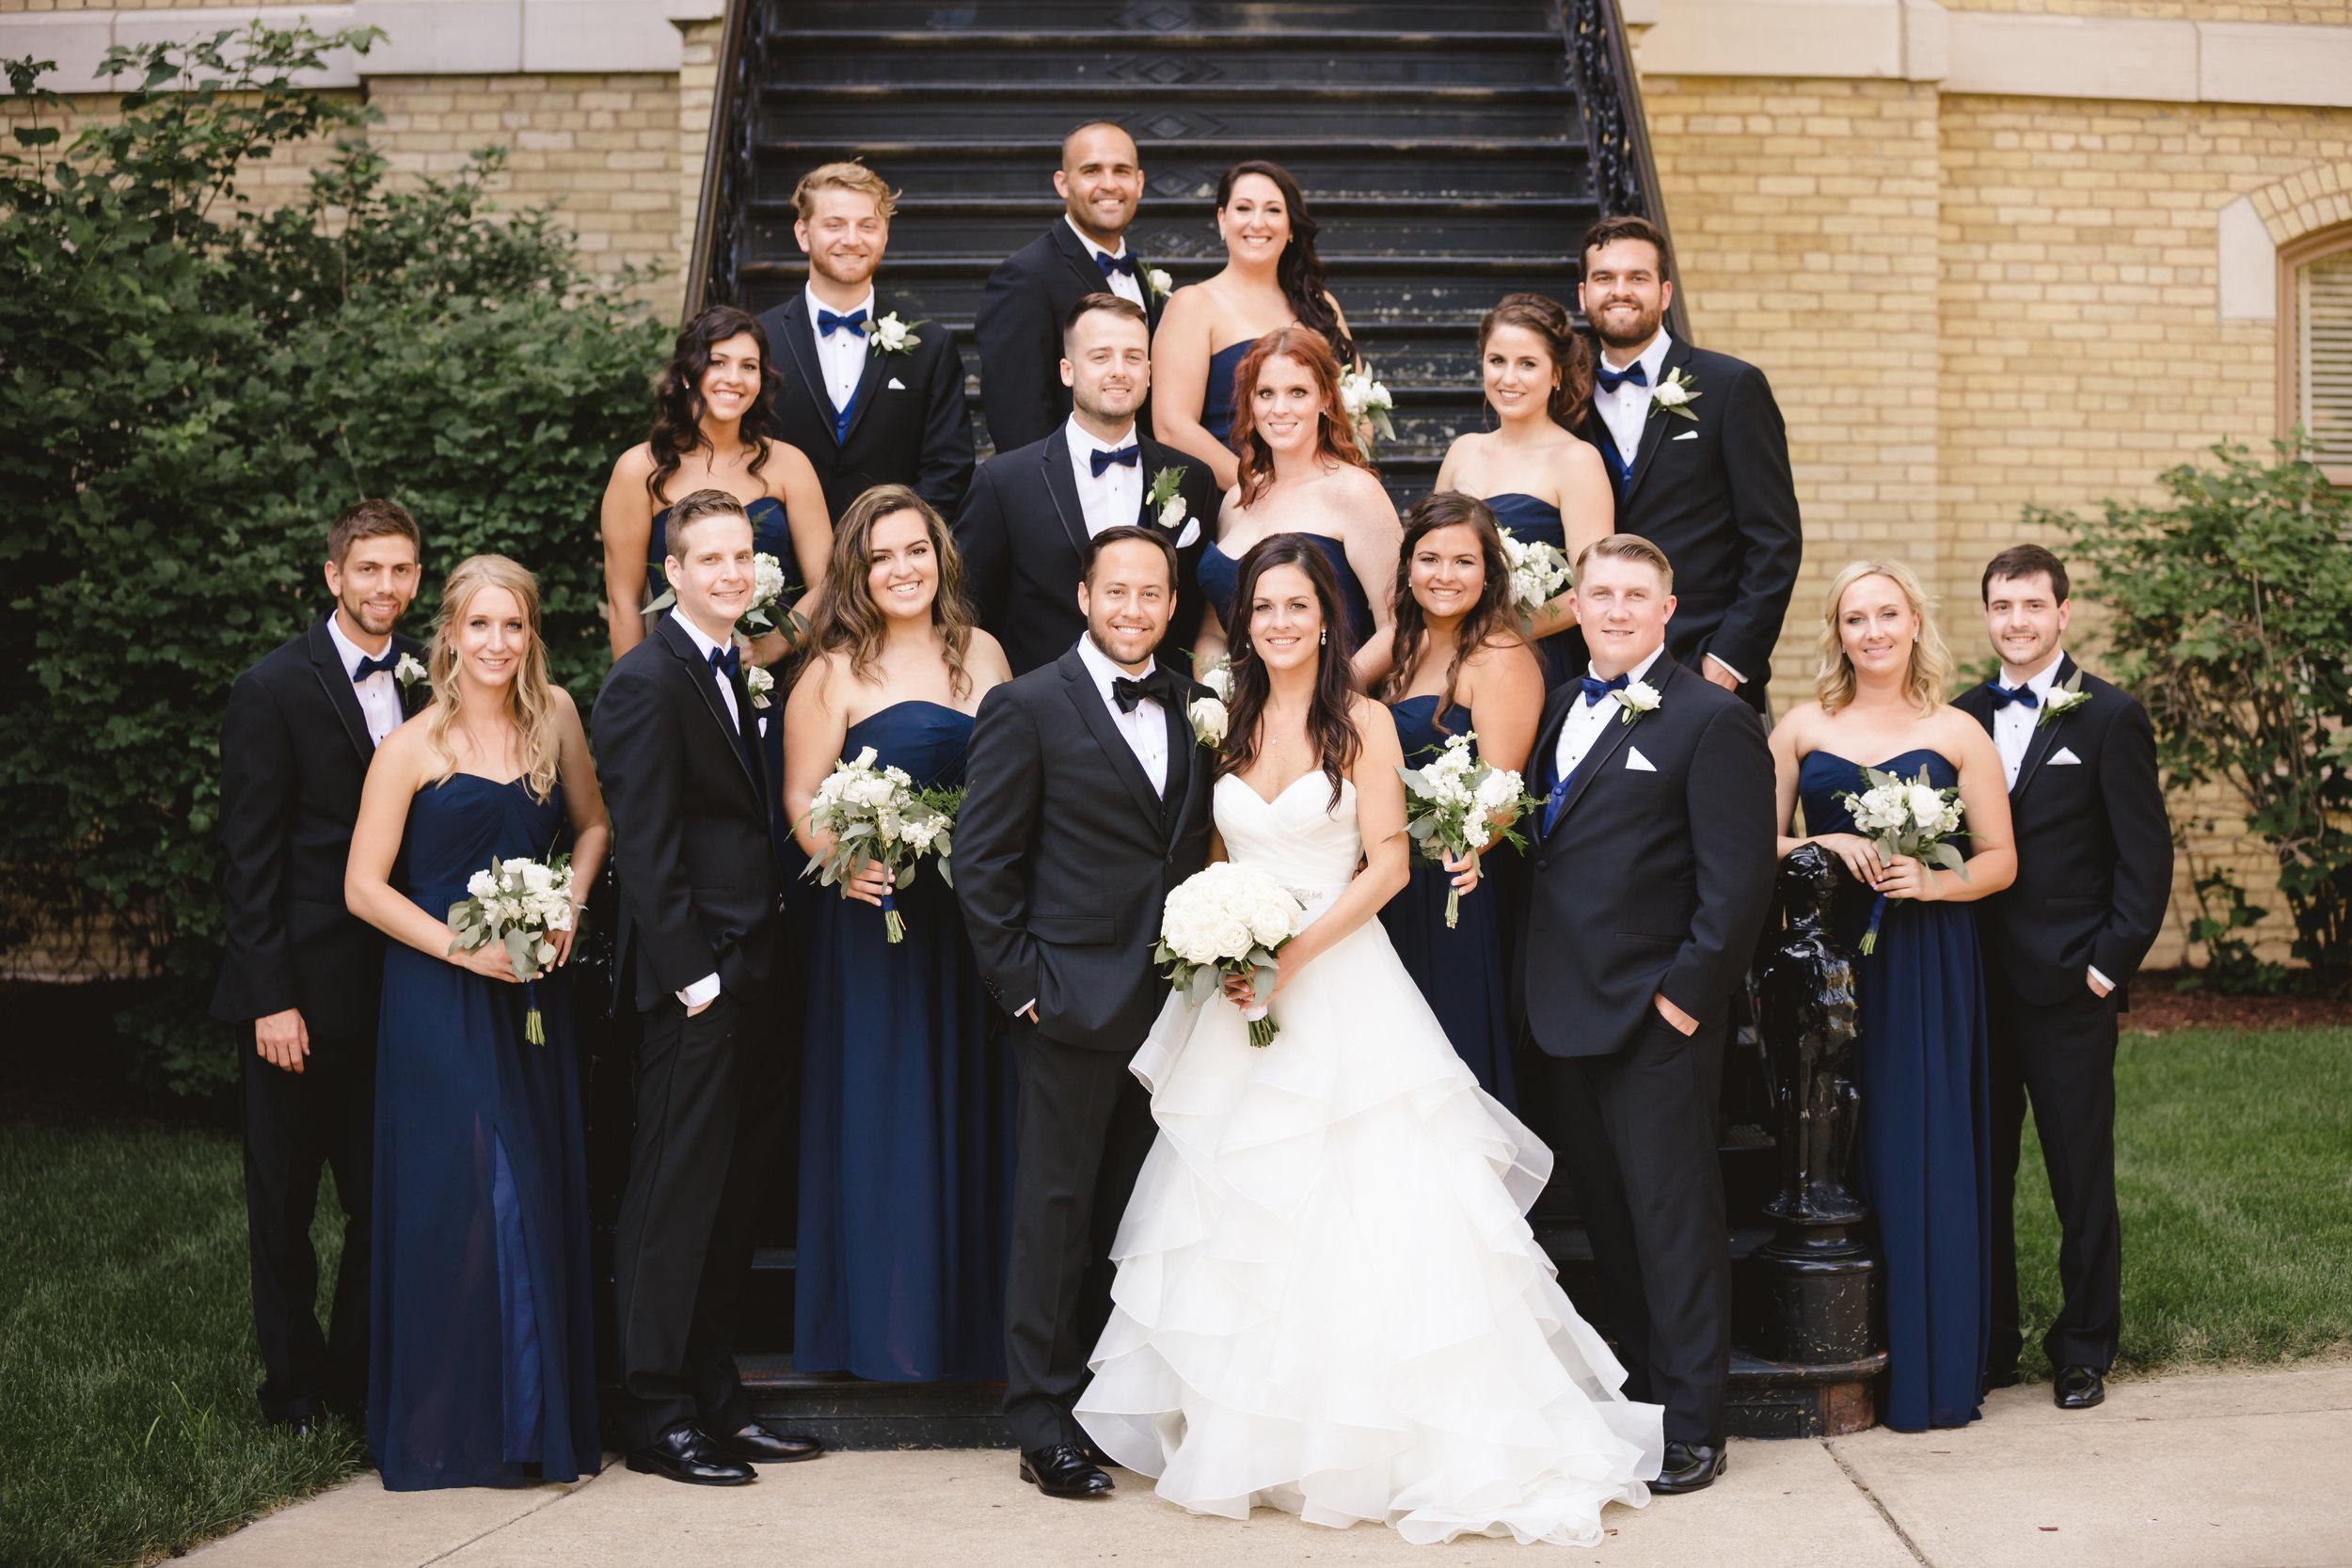 nordstroms bridesmaids